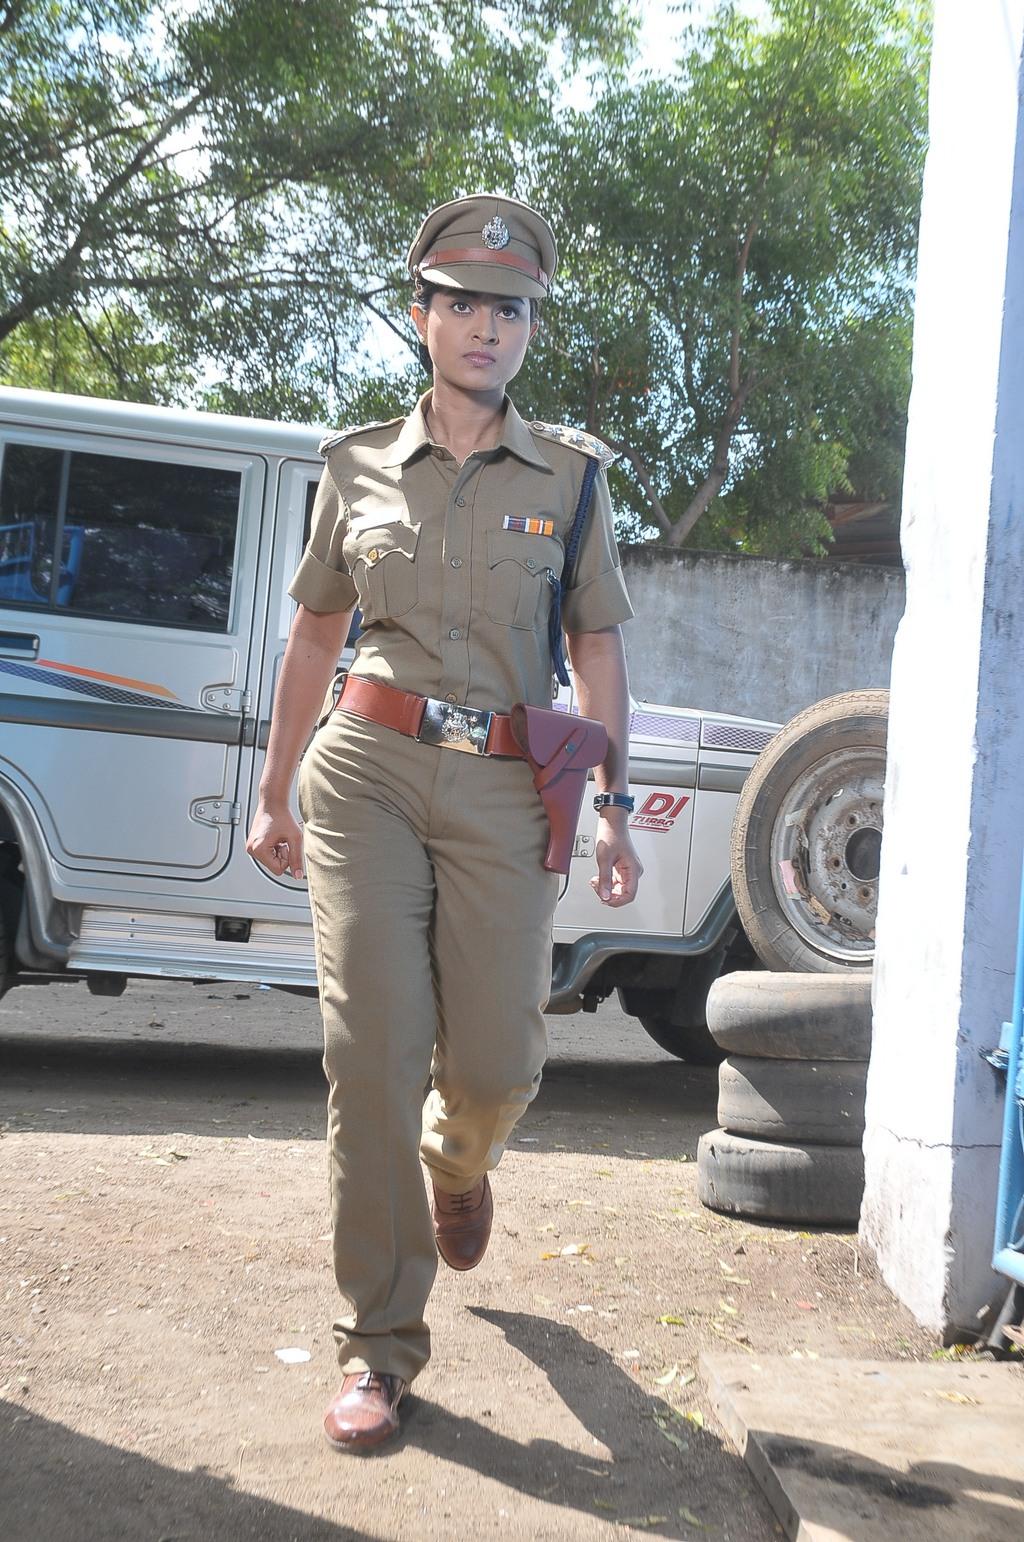 Rowdy Rathore Car Wallpaper Wallpaper Ips Officer Free Download Wallpaper Dawallpaperz